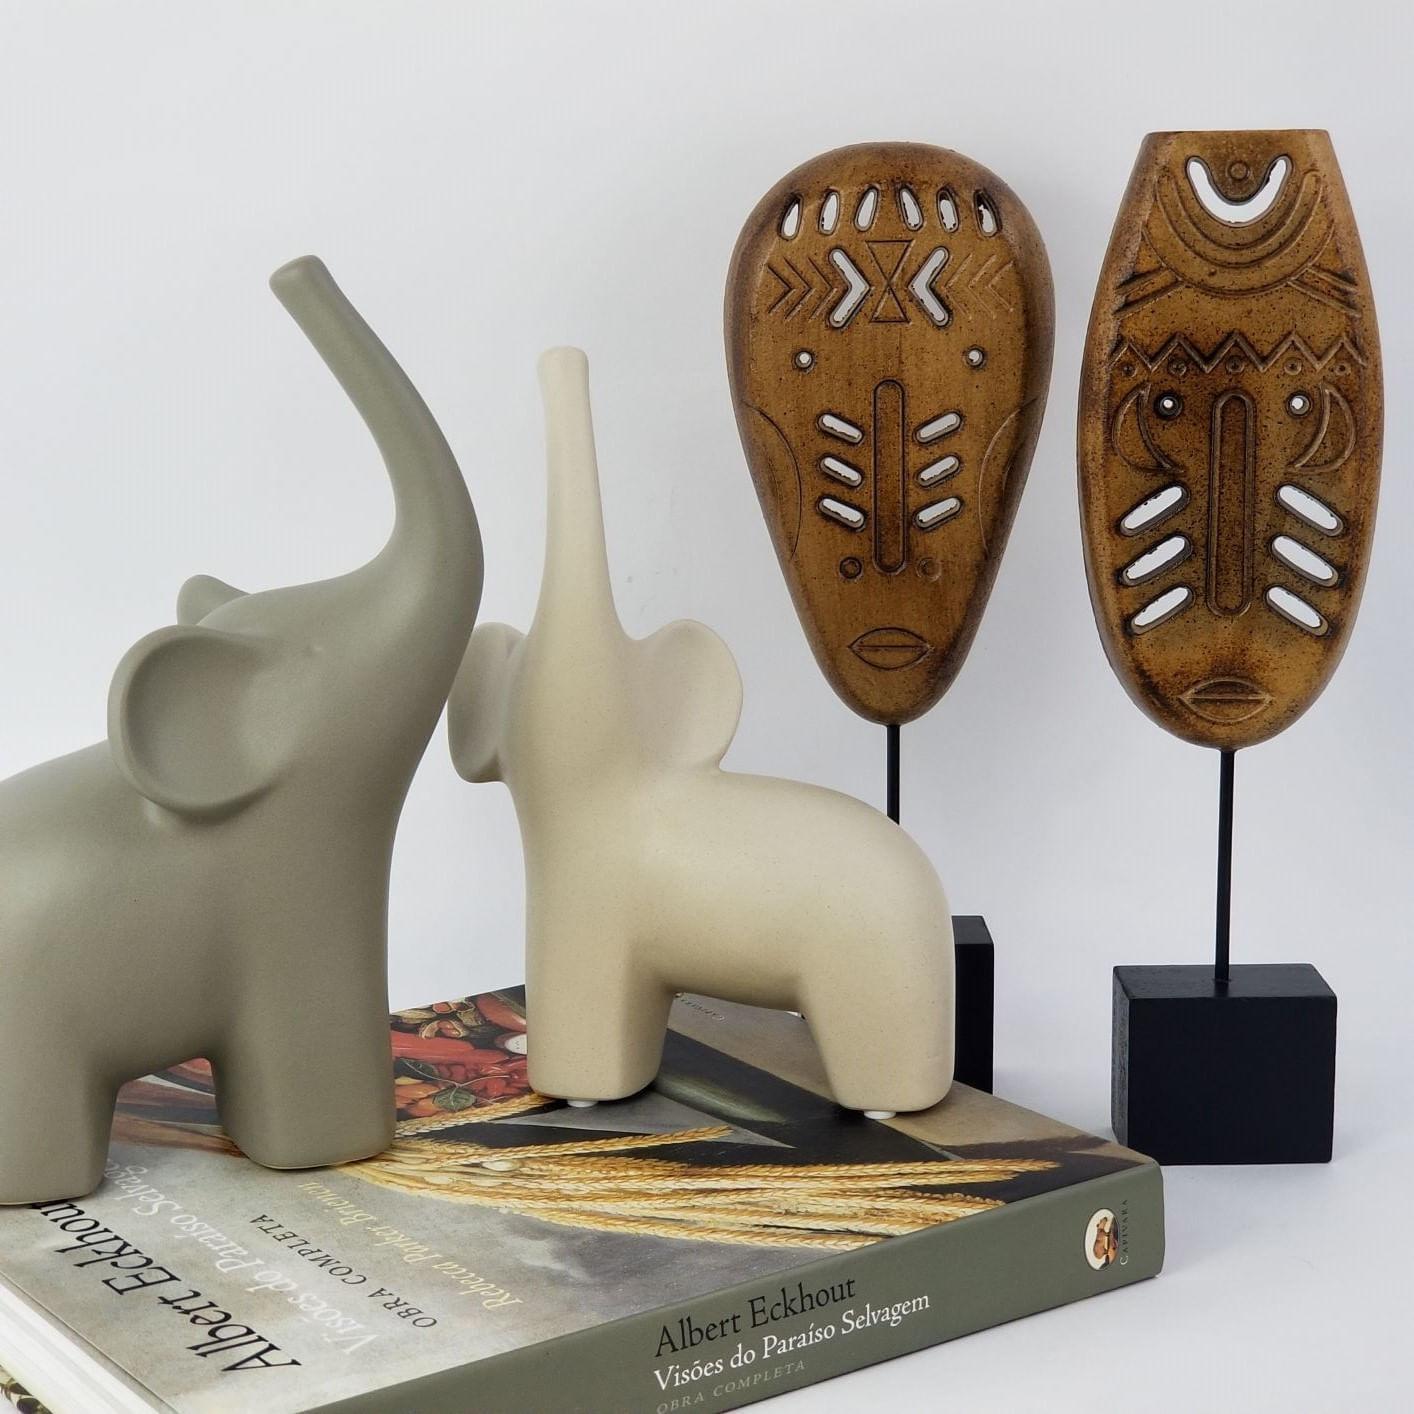 Kit 2 Rostos / Máscaras de Madeira - Estilo Étnico Africano